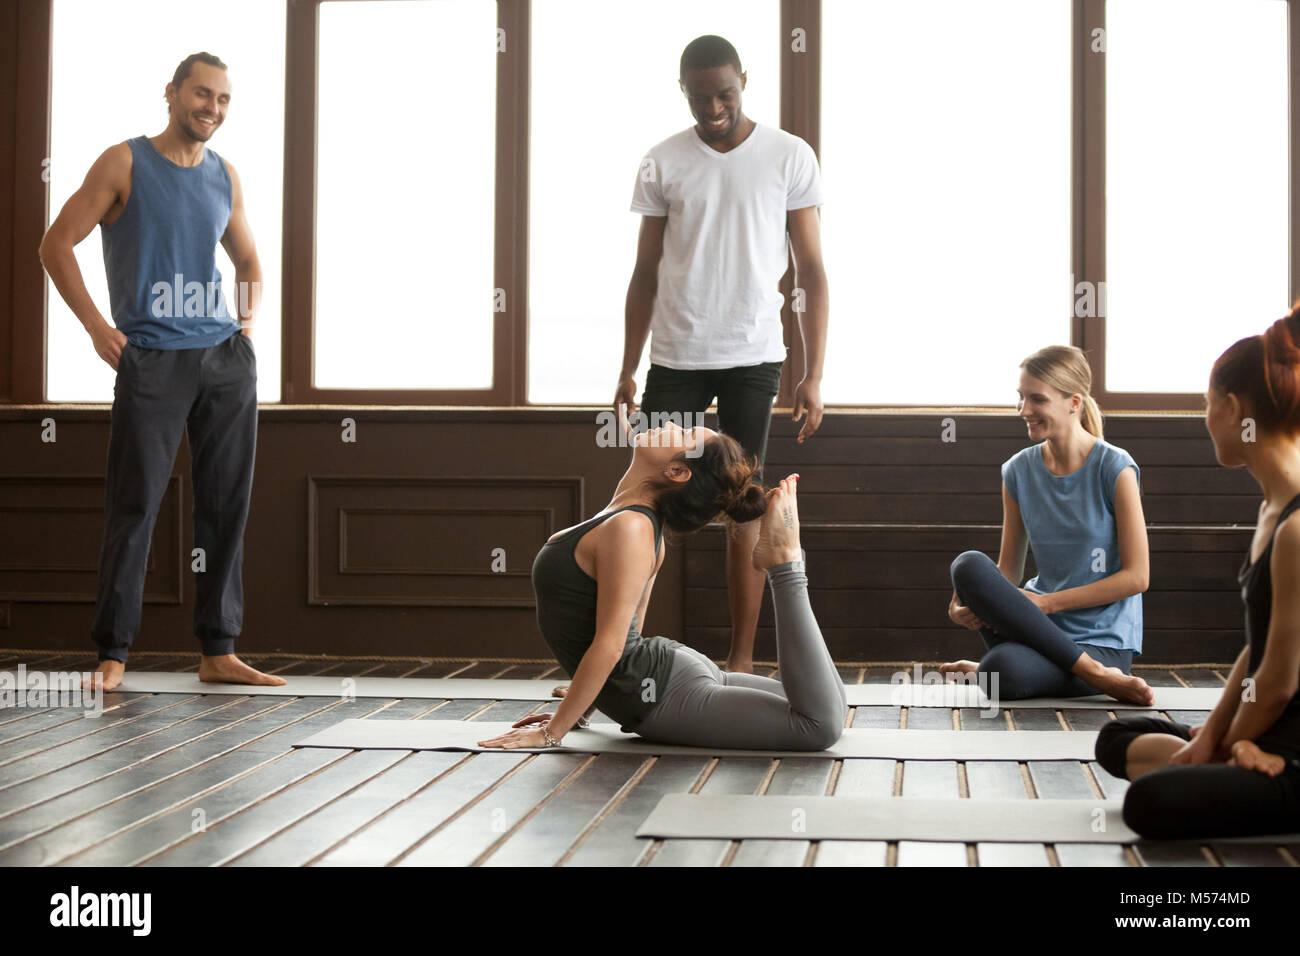 Istruttore Yoga esecuzione di raja bhudjangasana esercizio avanzata Immagini Stock